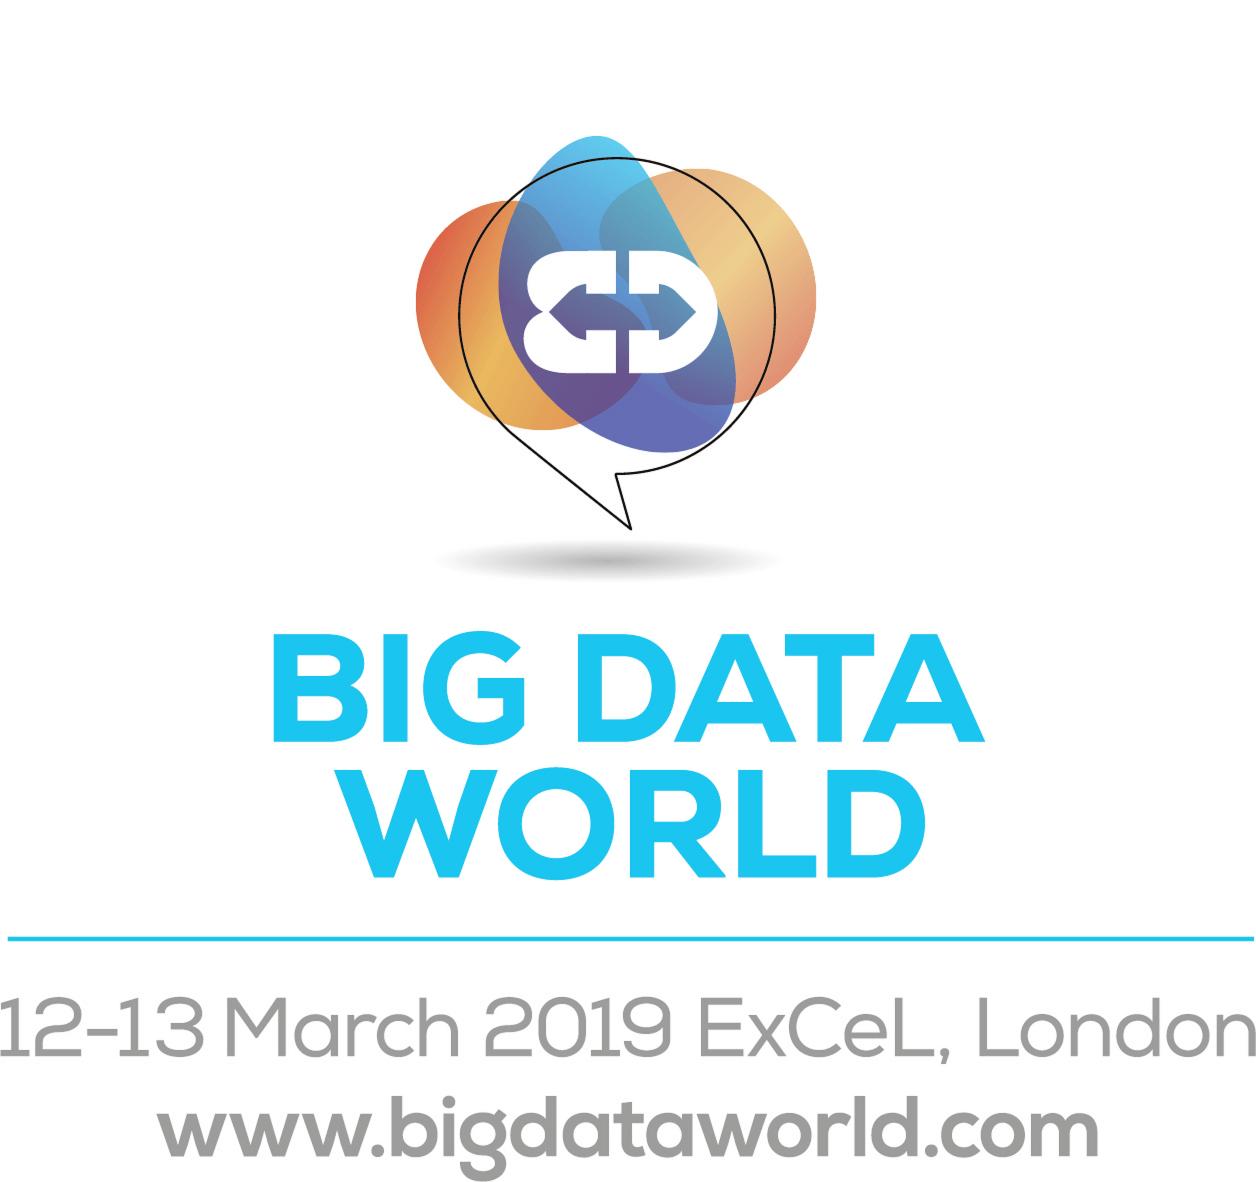 Big Data World London, 12-13th March 2019